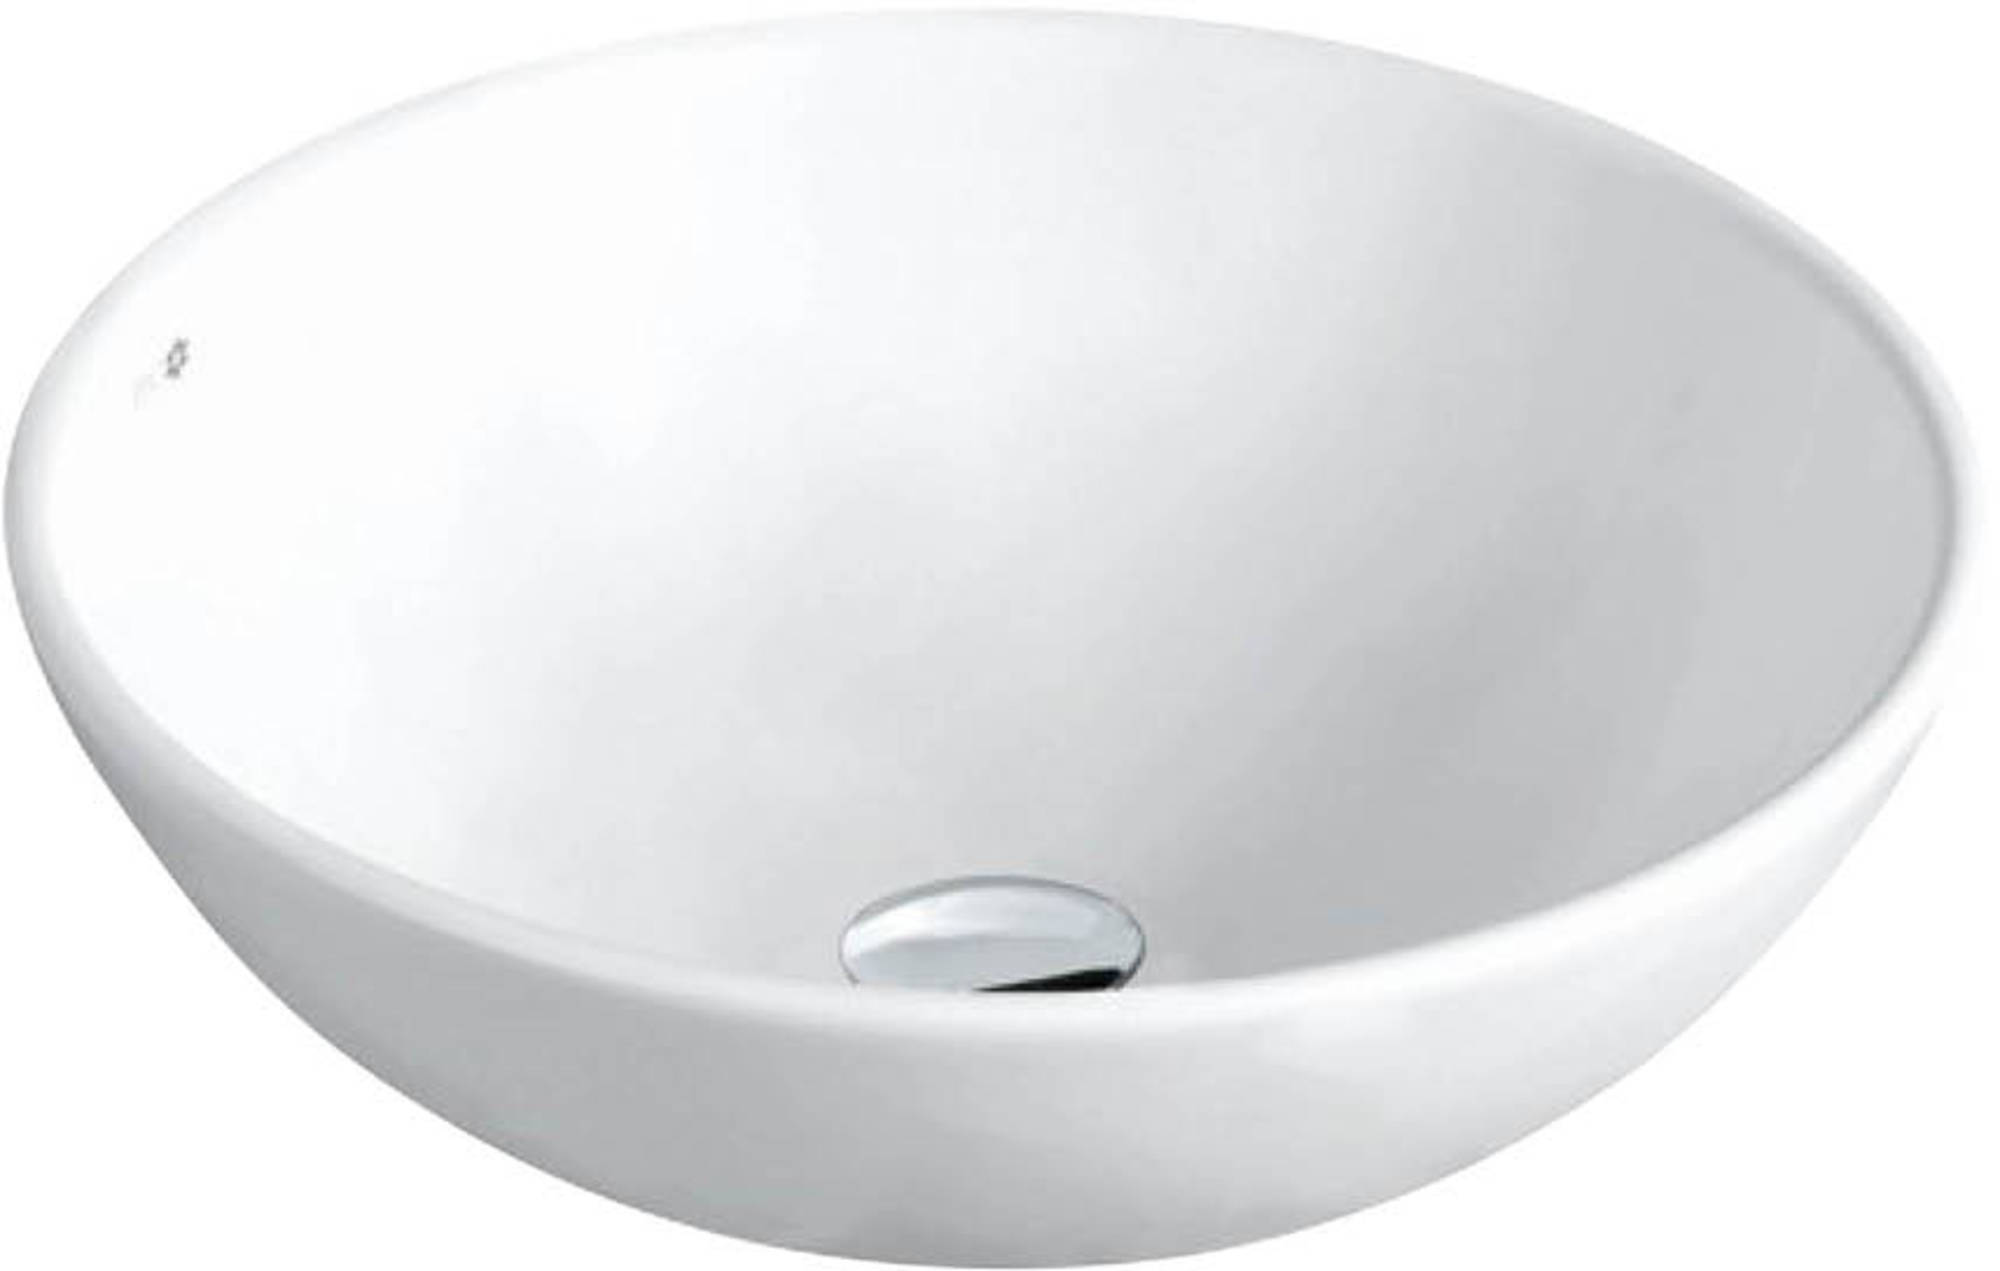 Van Heck Opbouwkom Ø 43x14,5 cm White